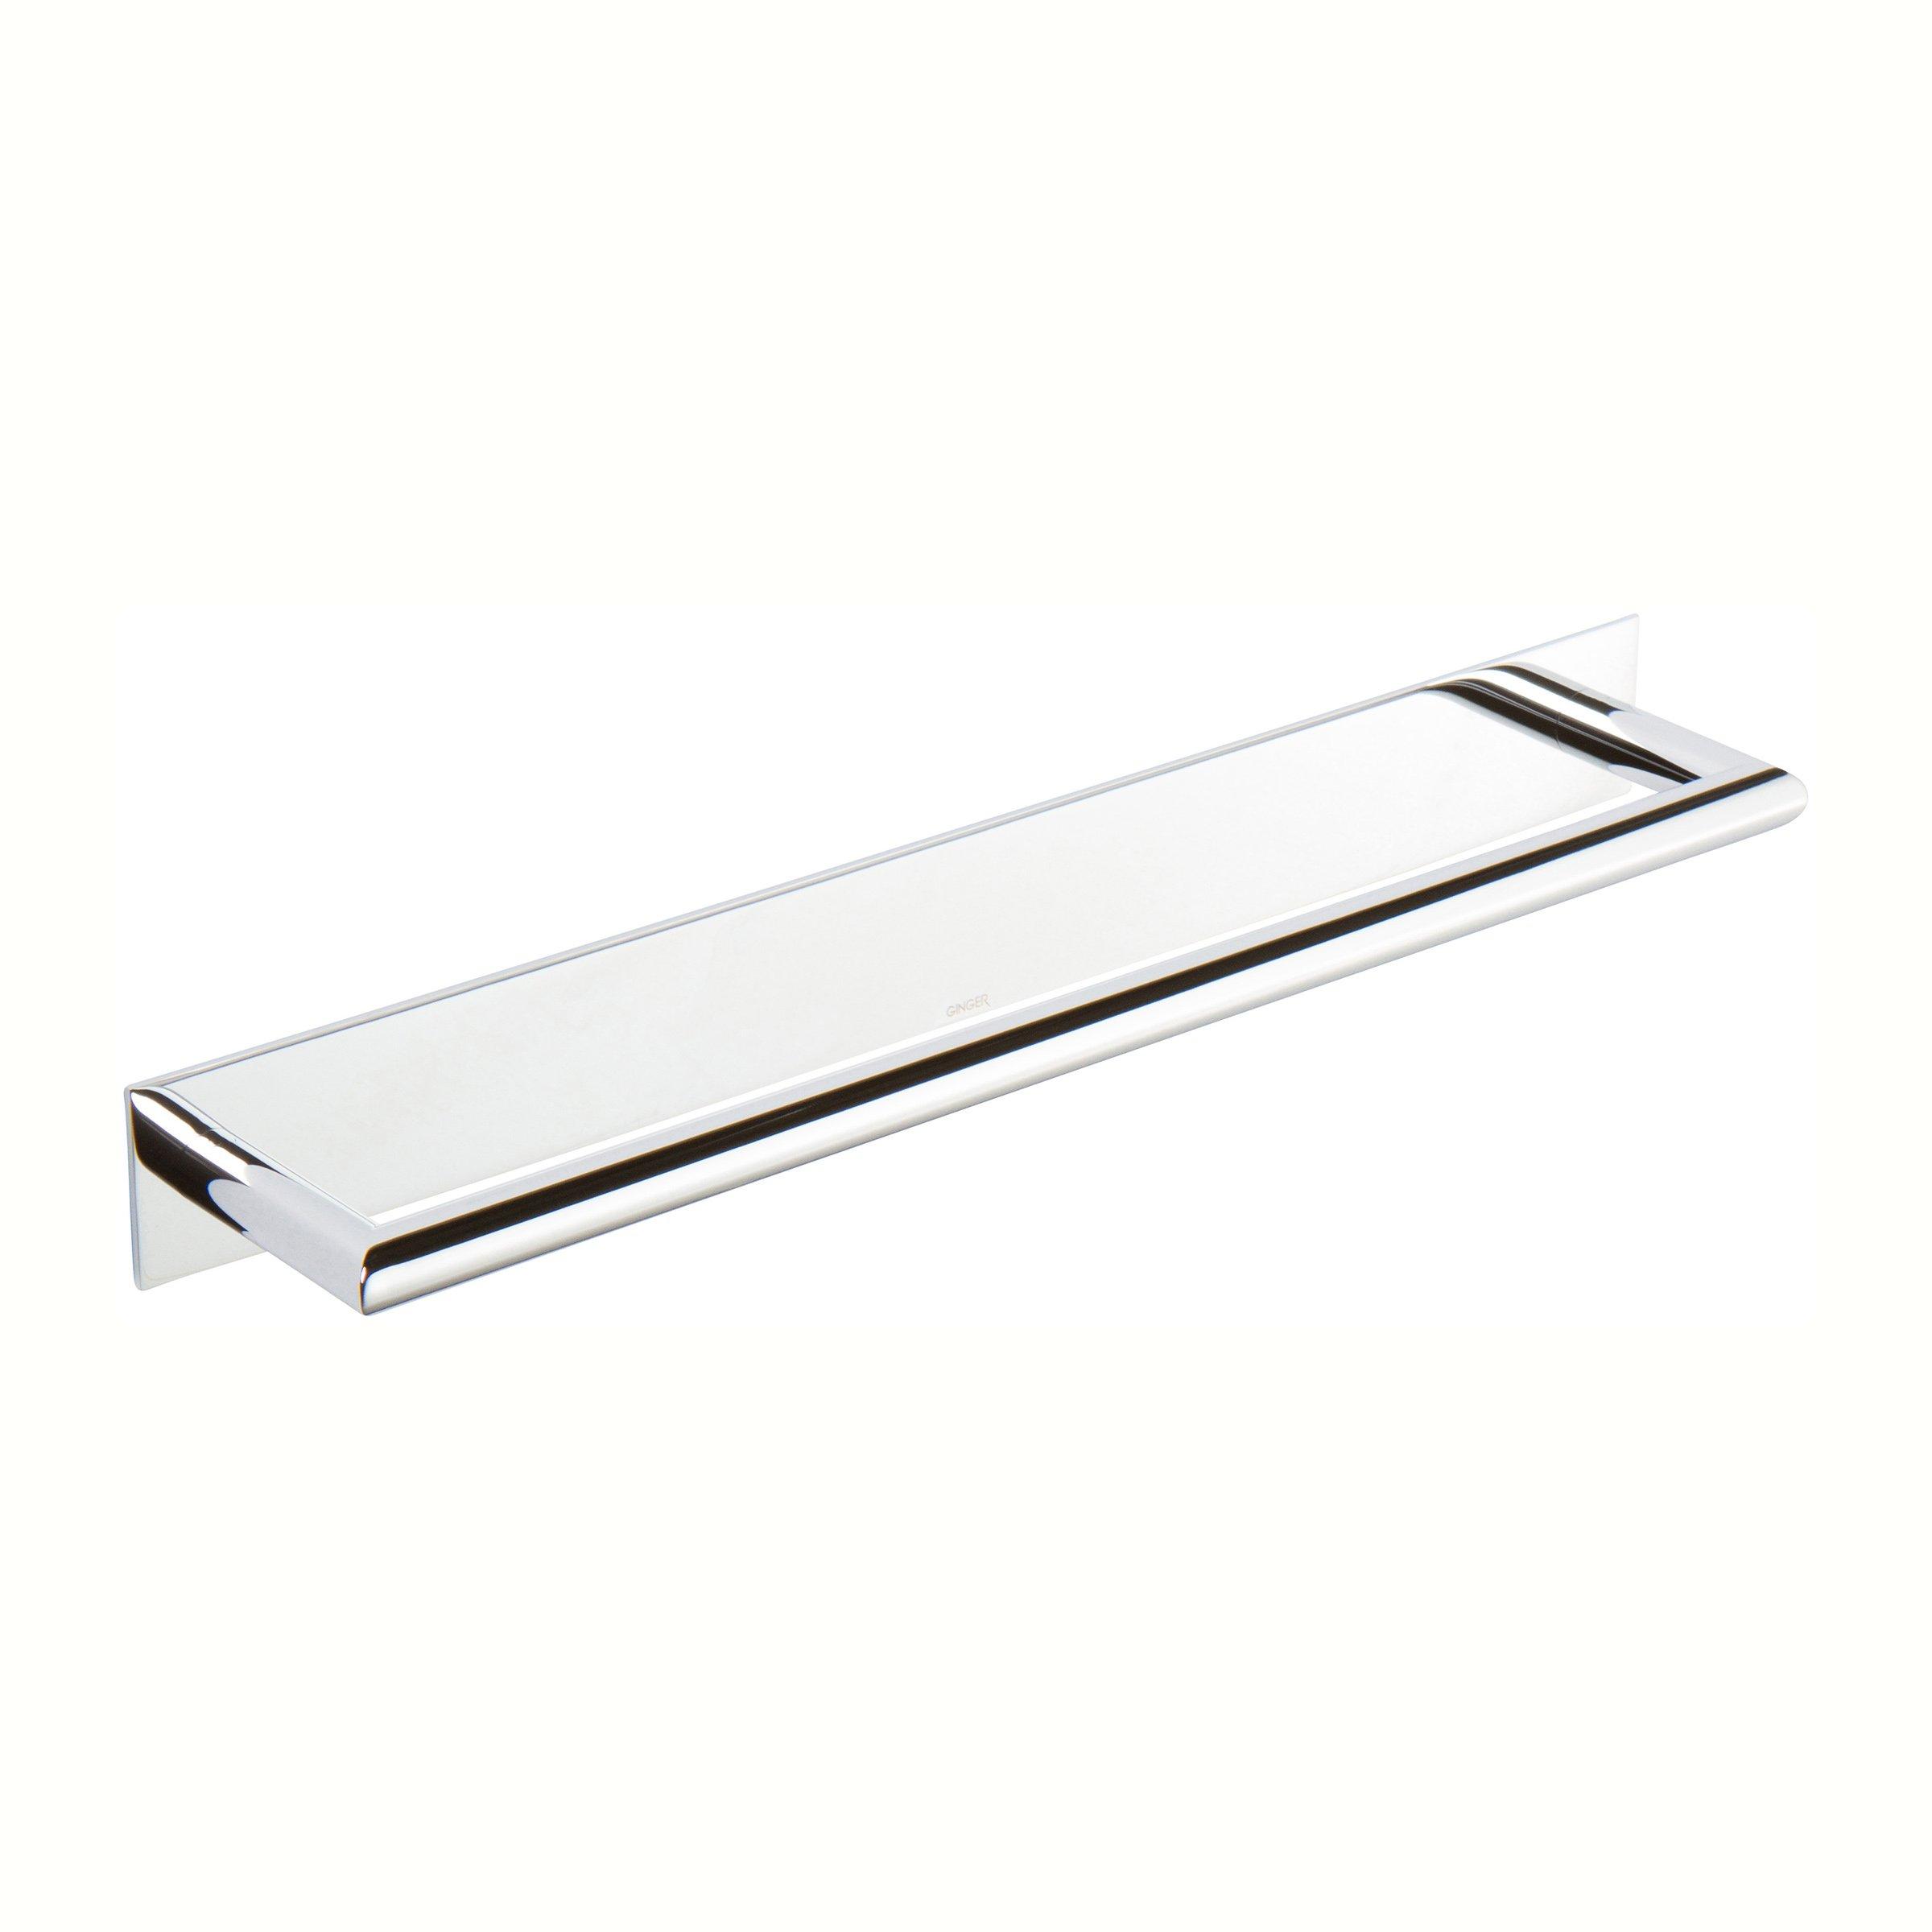 Ginger 2804/PC Surface Towel Bar, 32'', Polished Chrome